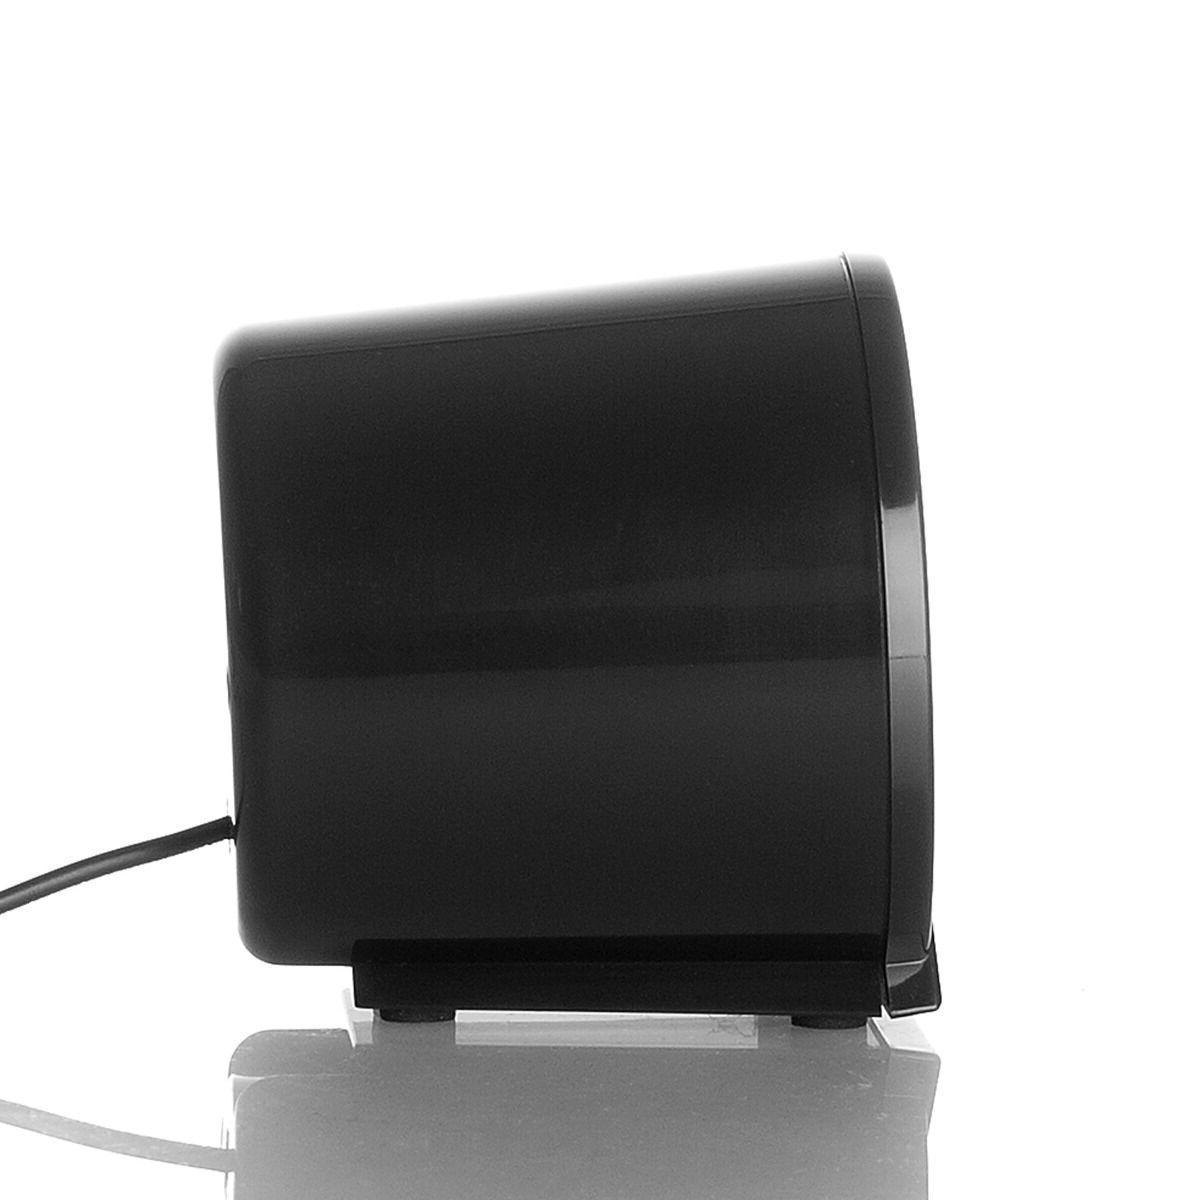 Frisby Mini 2.0 Notebook Speaker